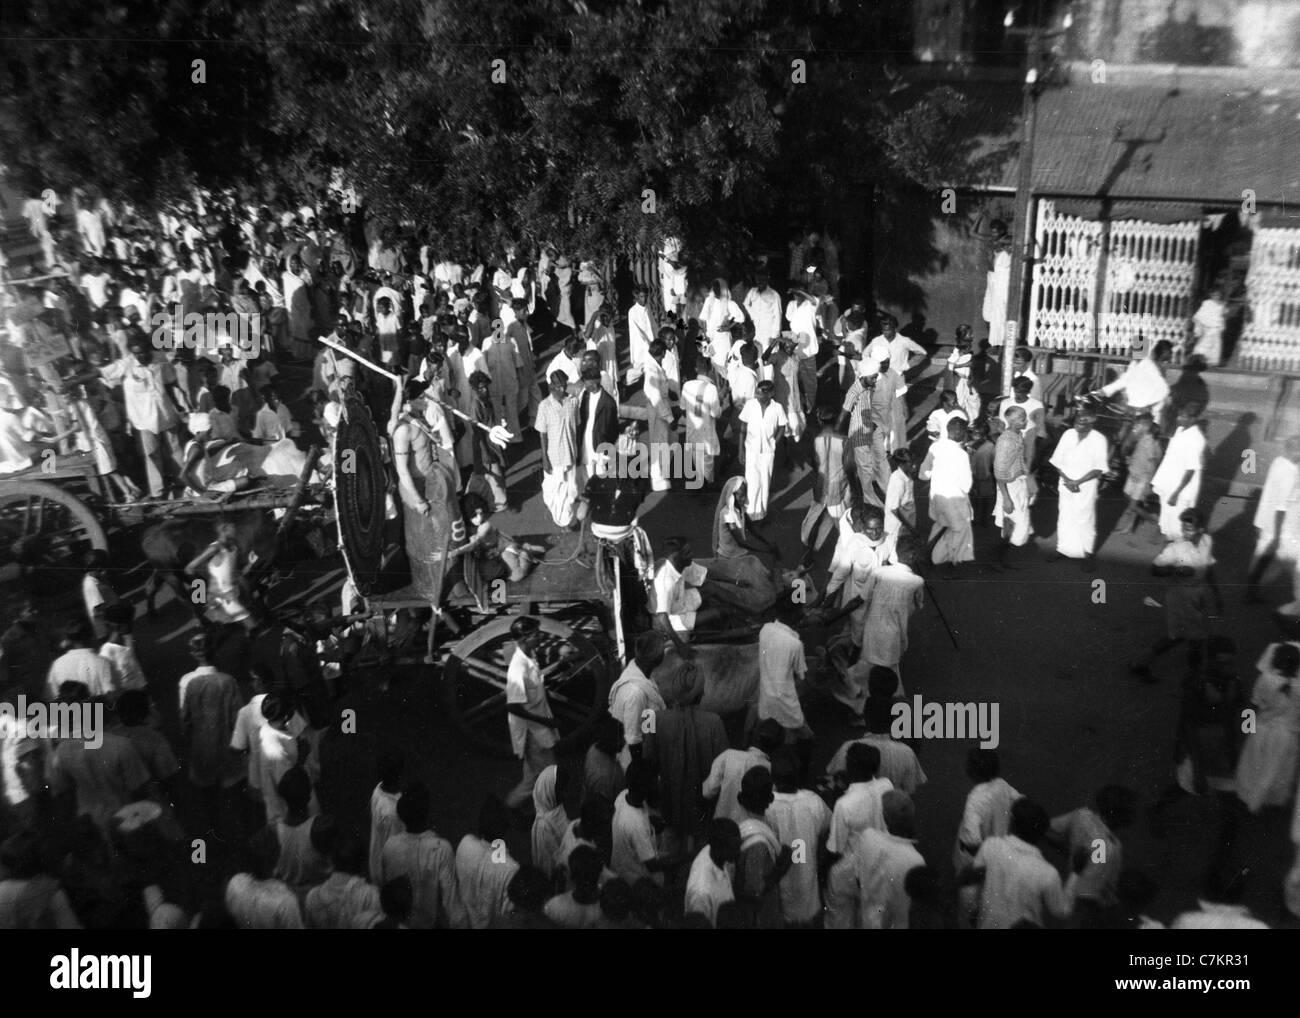 India religious symbolism wwii china burma india cbi war theatre 1940s street scene men gods hindu